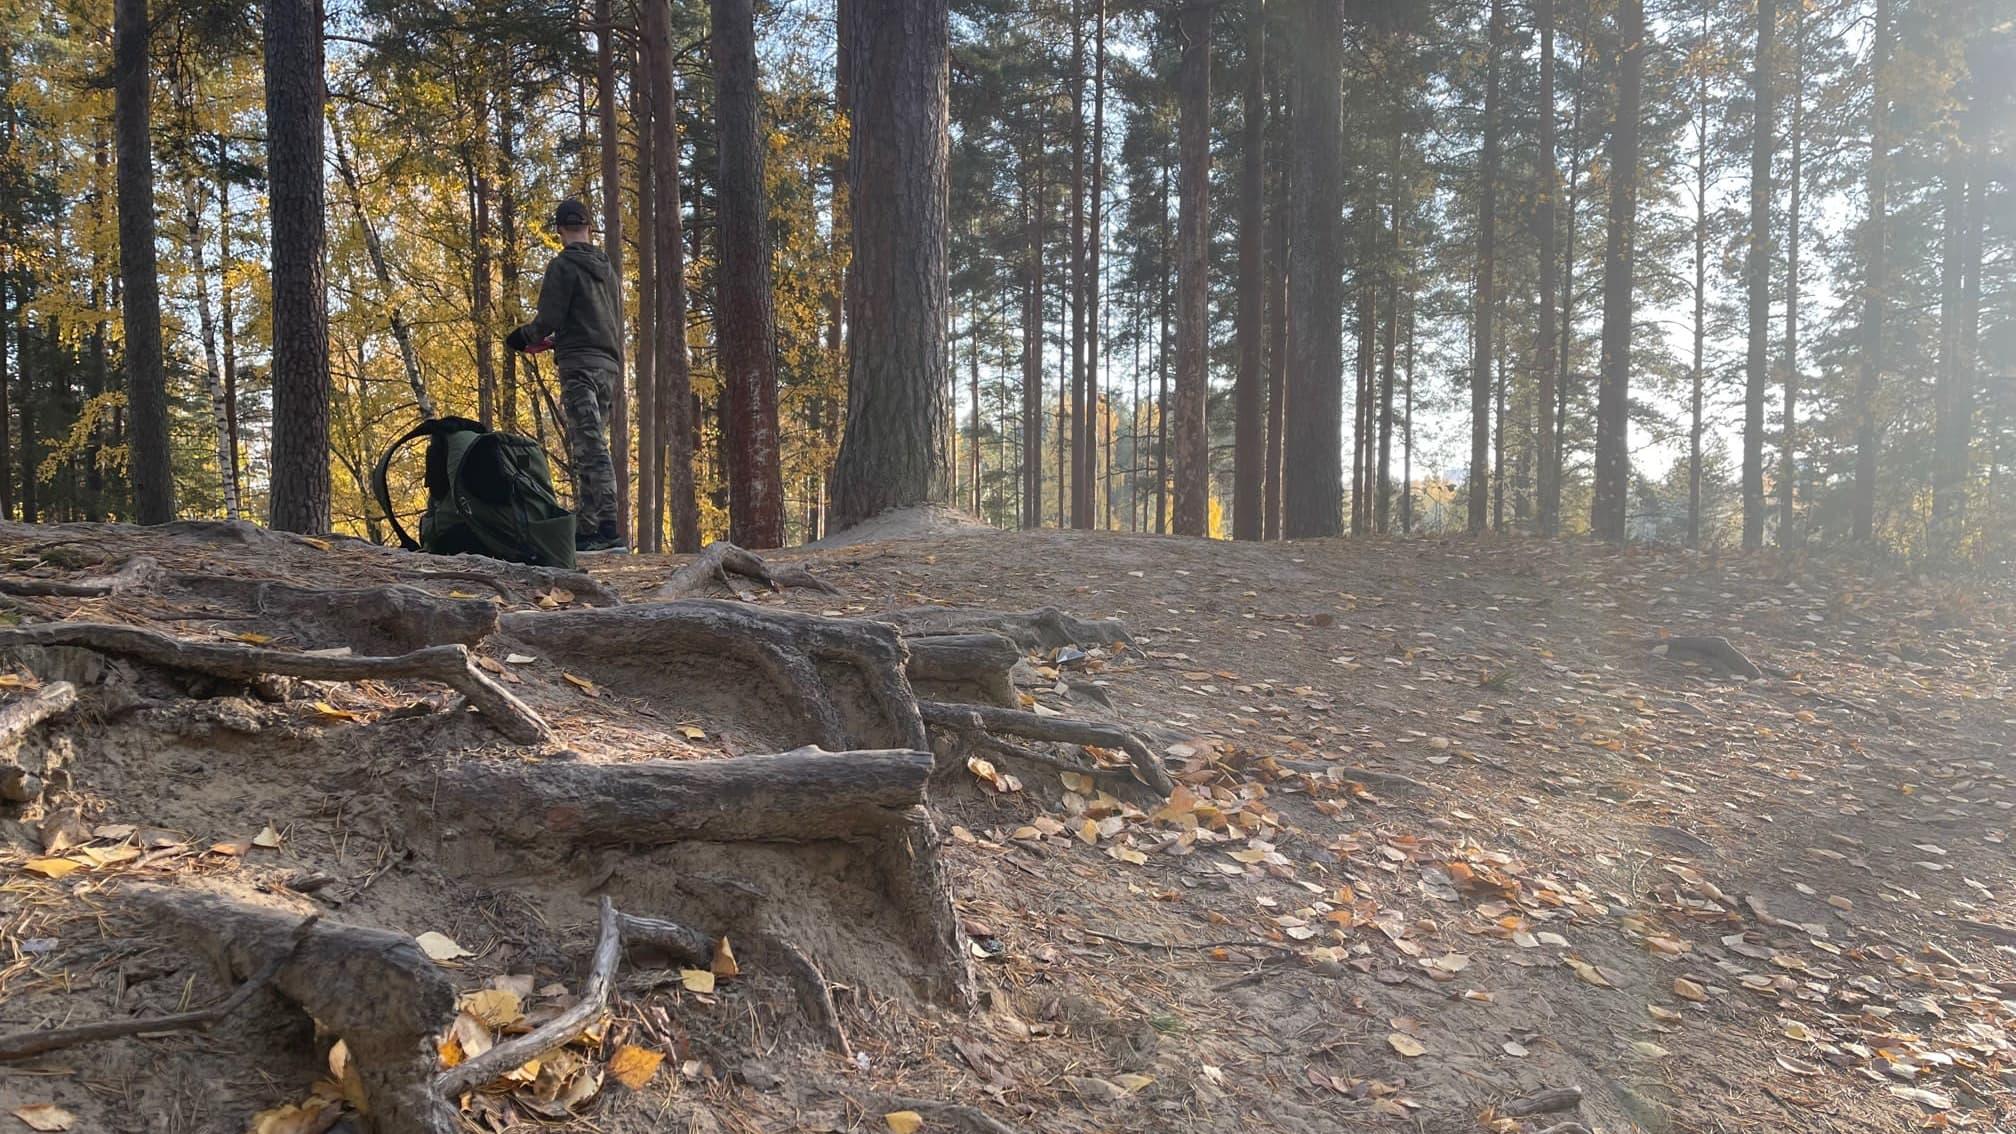 Frisbeegolfaaja Joensuun Karsikon radalla.